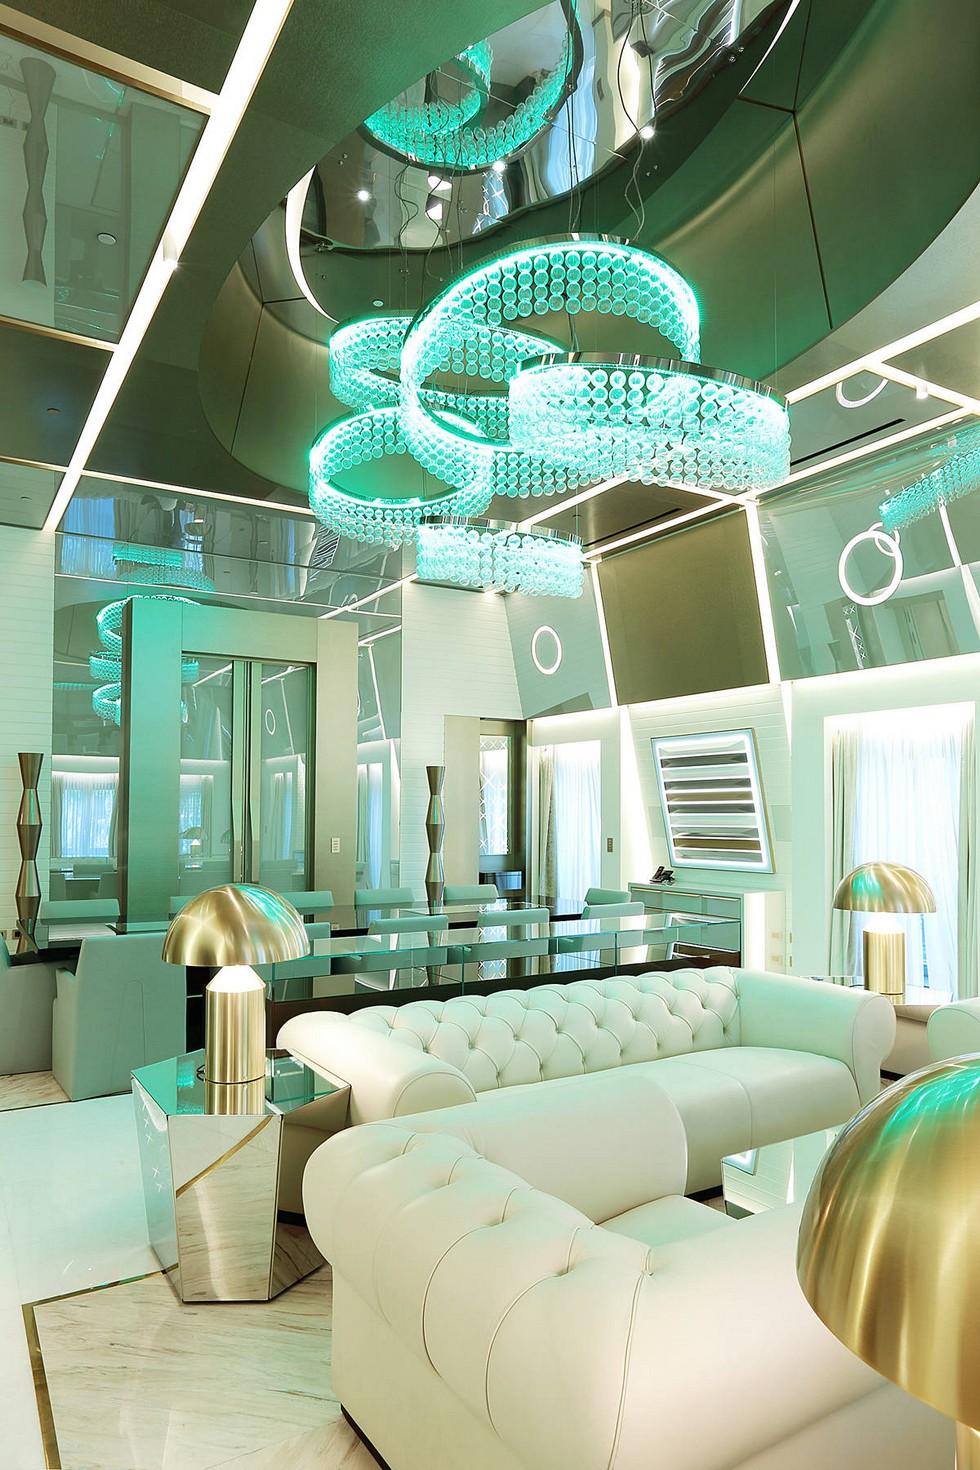 Milan Hotels Excelsior's Katara Suite awarded as world best suite (8)